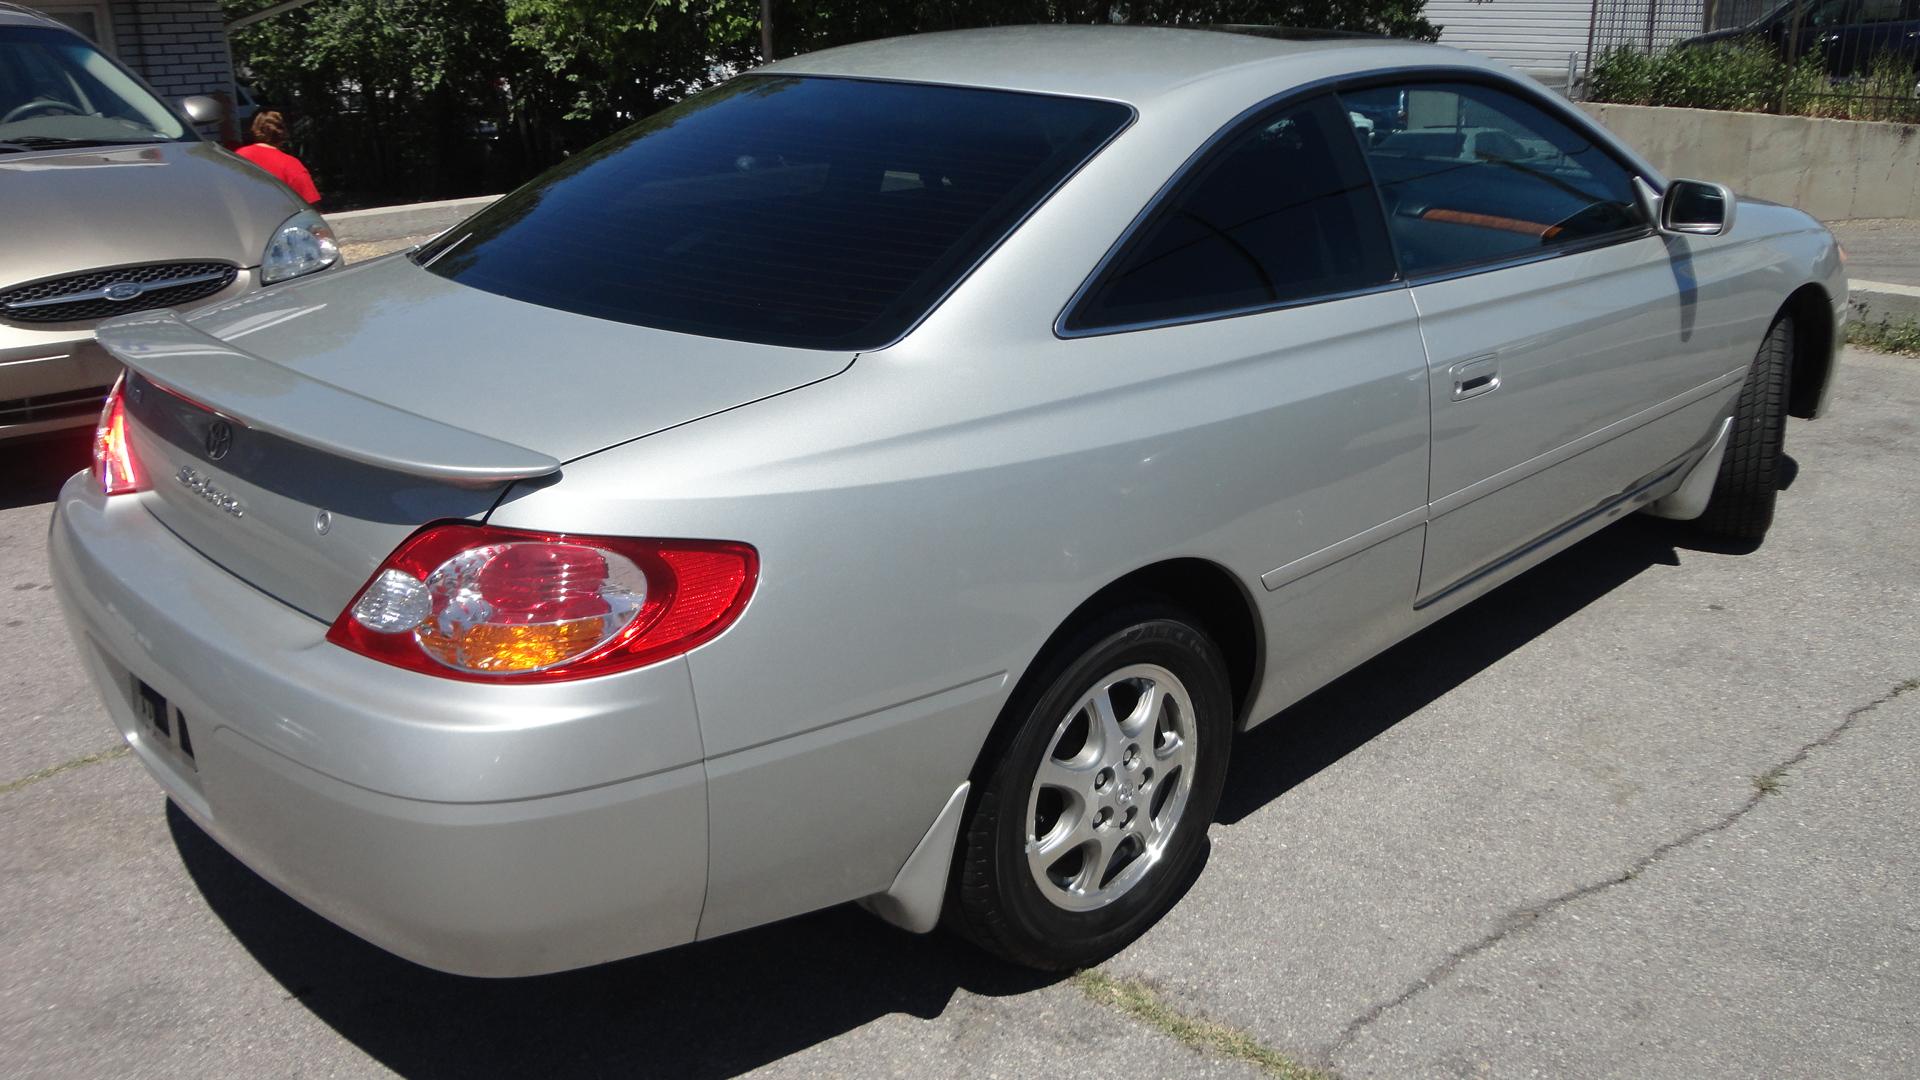 2002 Toyota Camry Solara Image 4